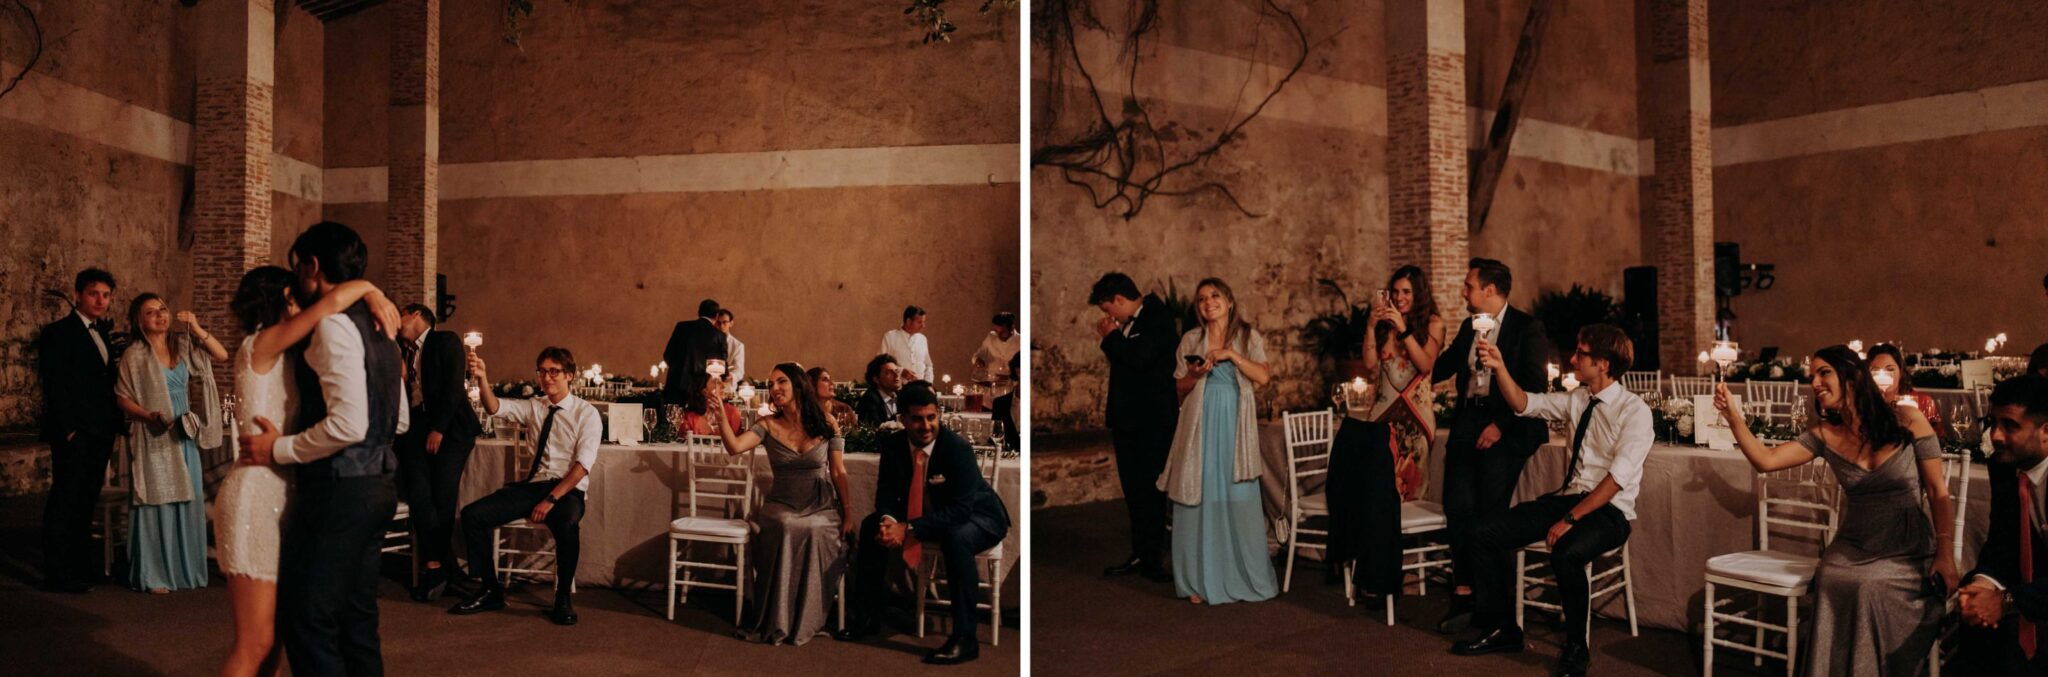 Caterina and Giacomo's wedding, Villa Grabau in Tuscany